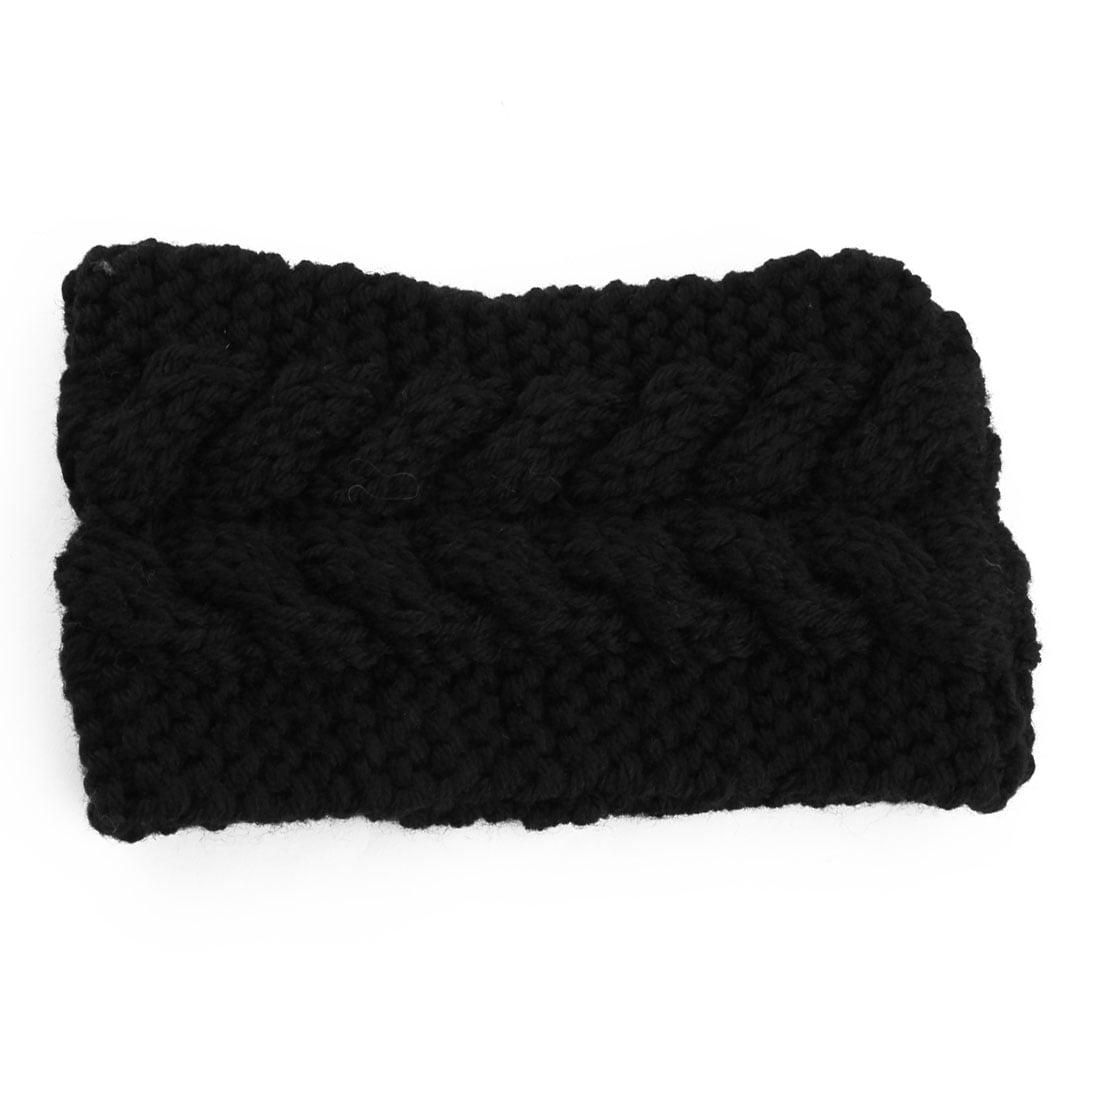 Woman Nylon Twist Braided knitted Head Wrap Hair Band Sports Ski Headband Black